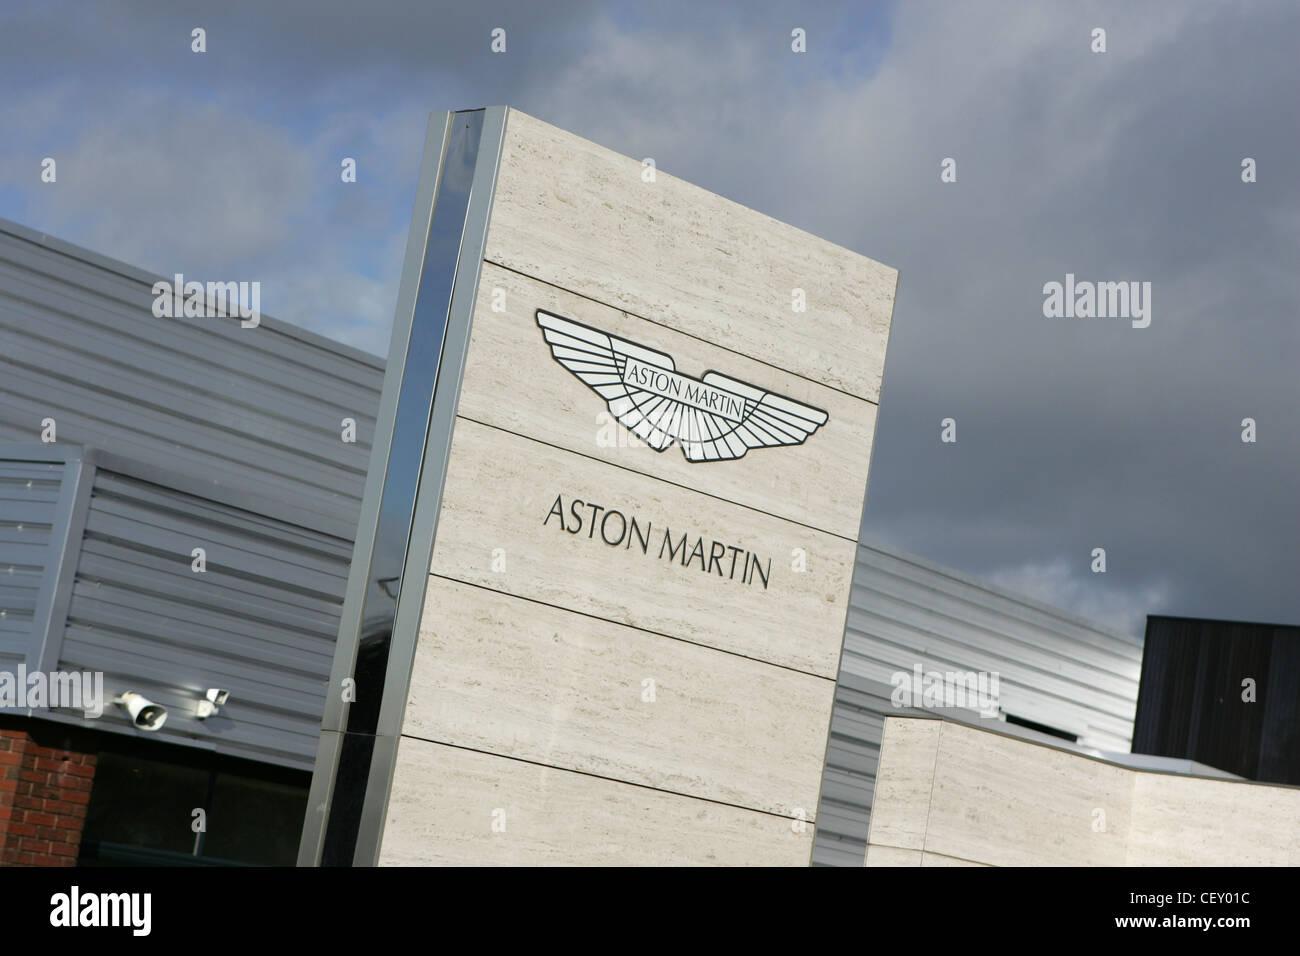 aston martin cars dealership, cheltenham uk - Stock Image